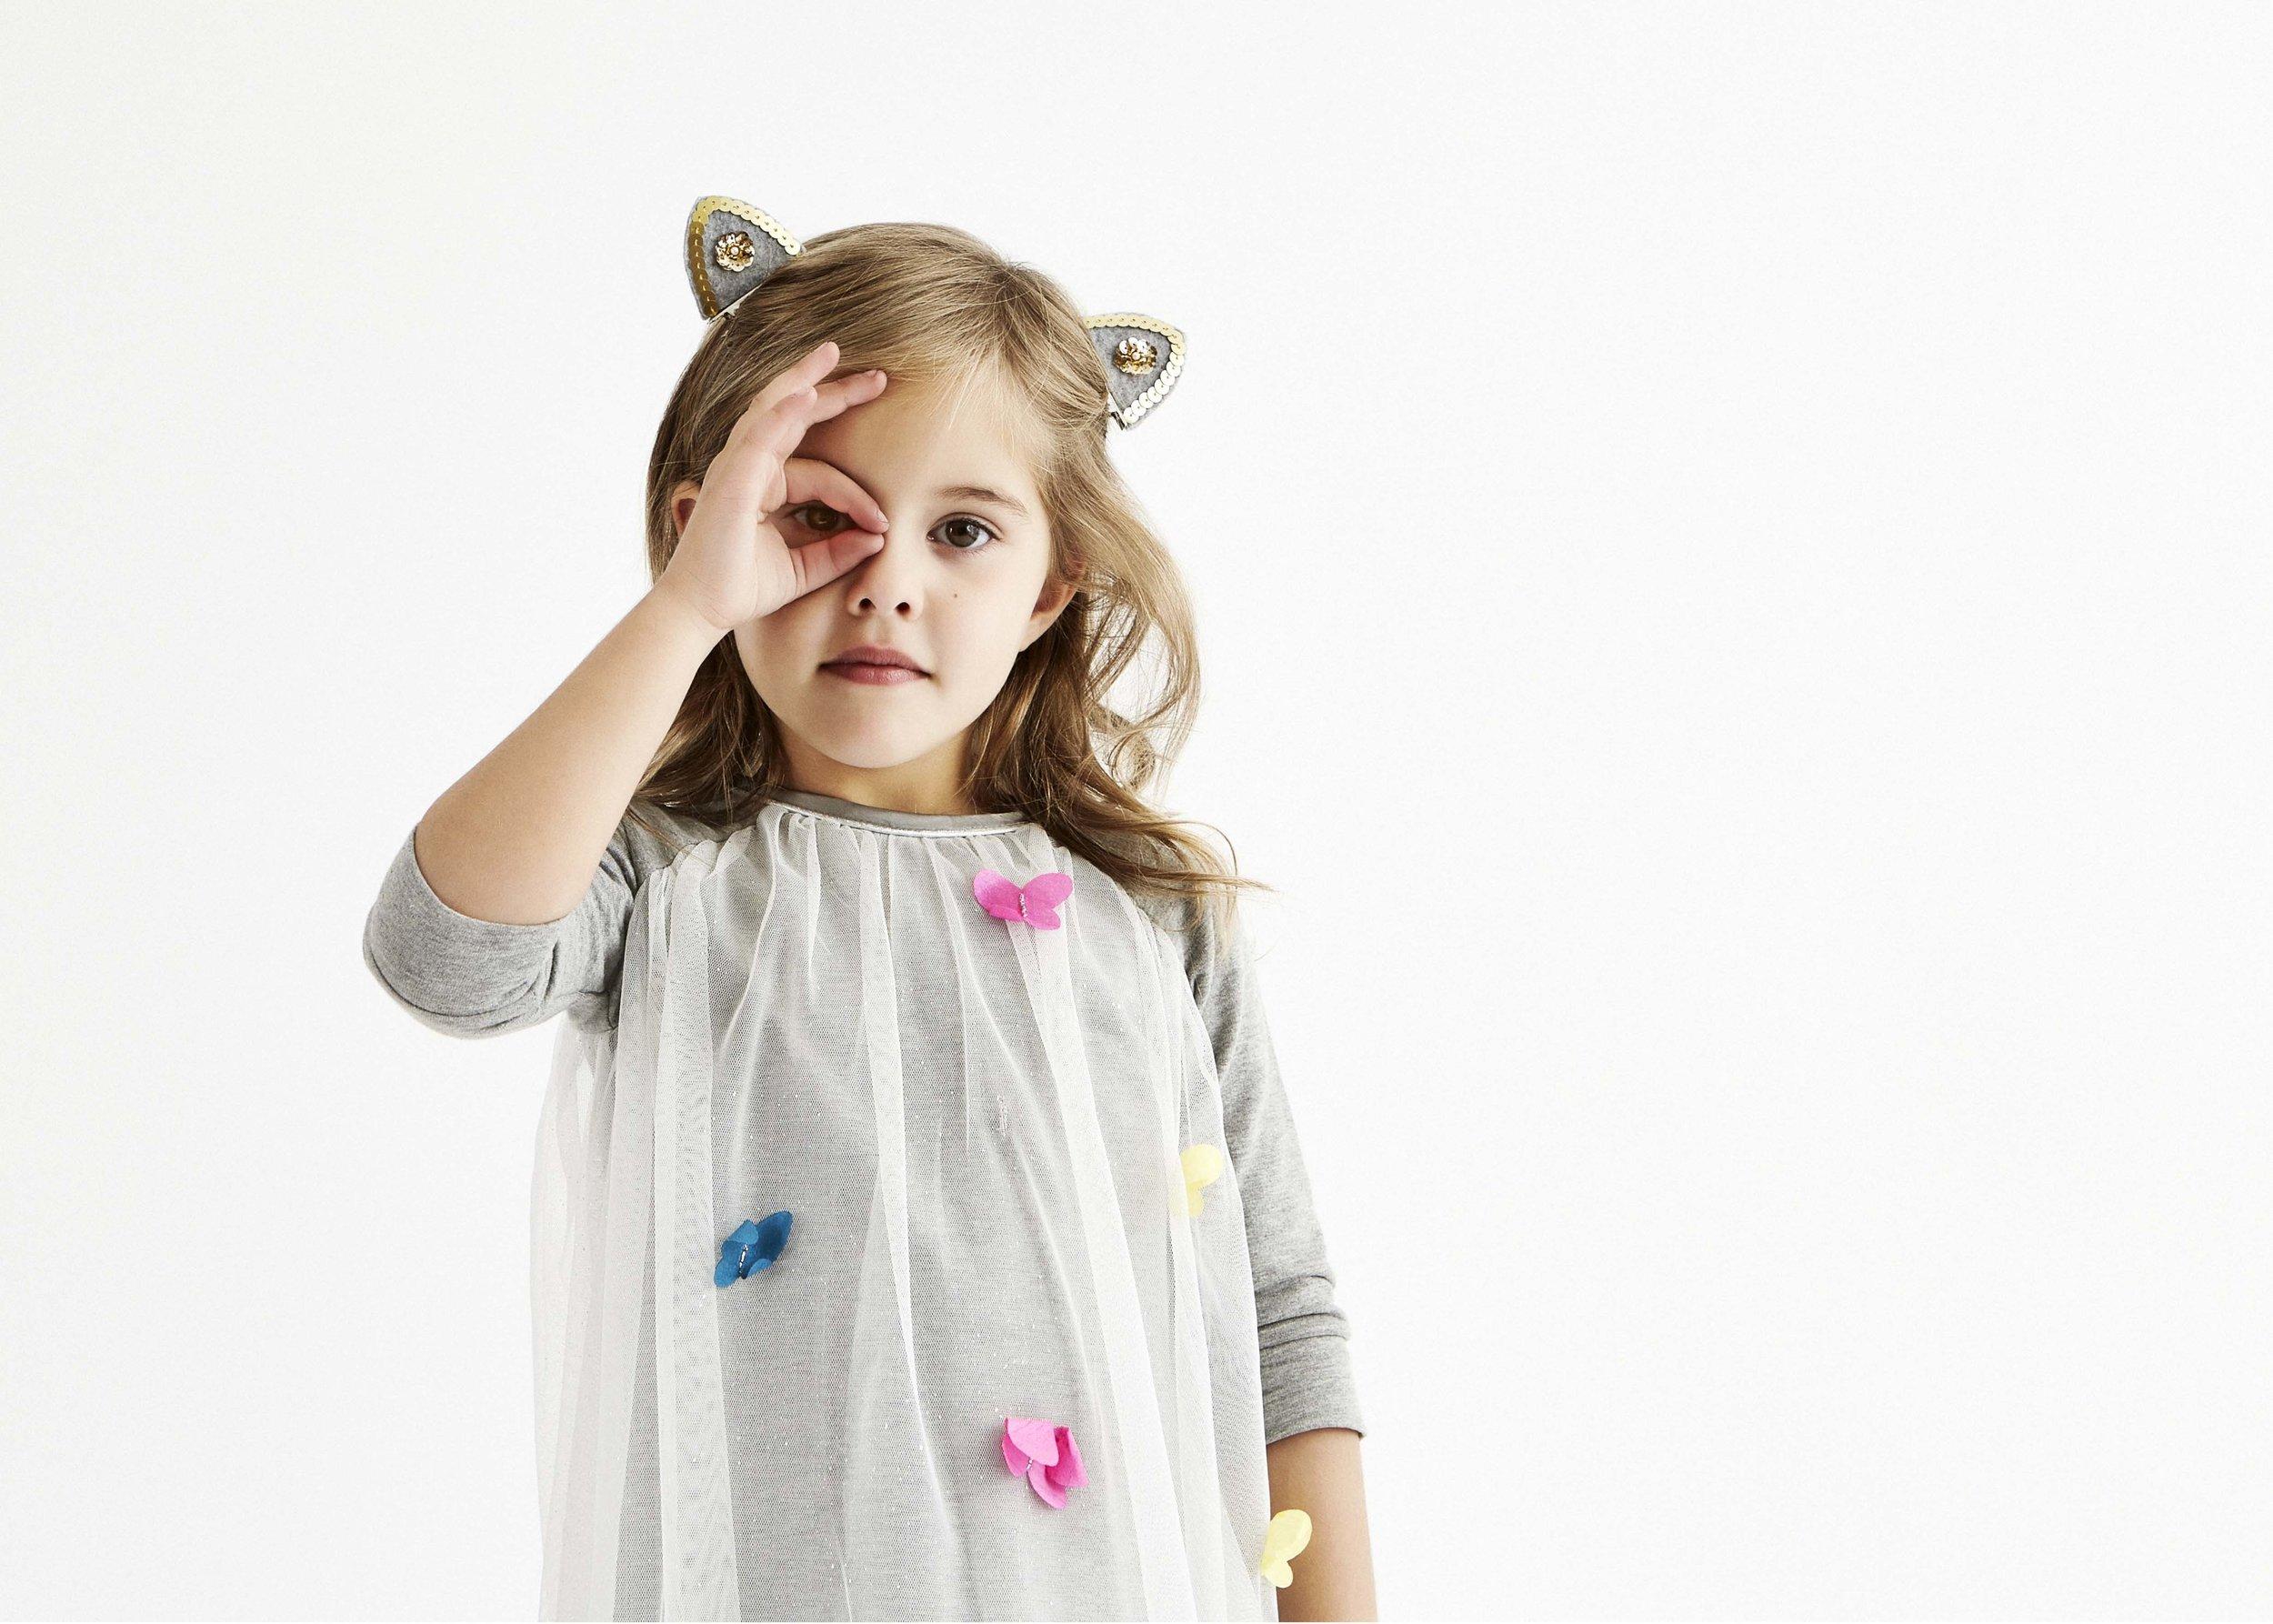 Liz_Cooper_Interior_Stylist_Styling_Kids_Fashion_Peeping.jpg